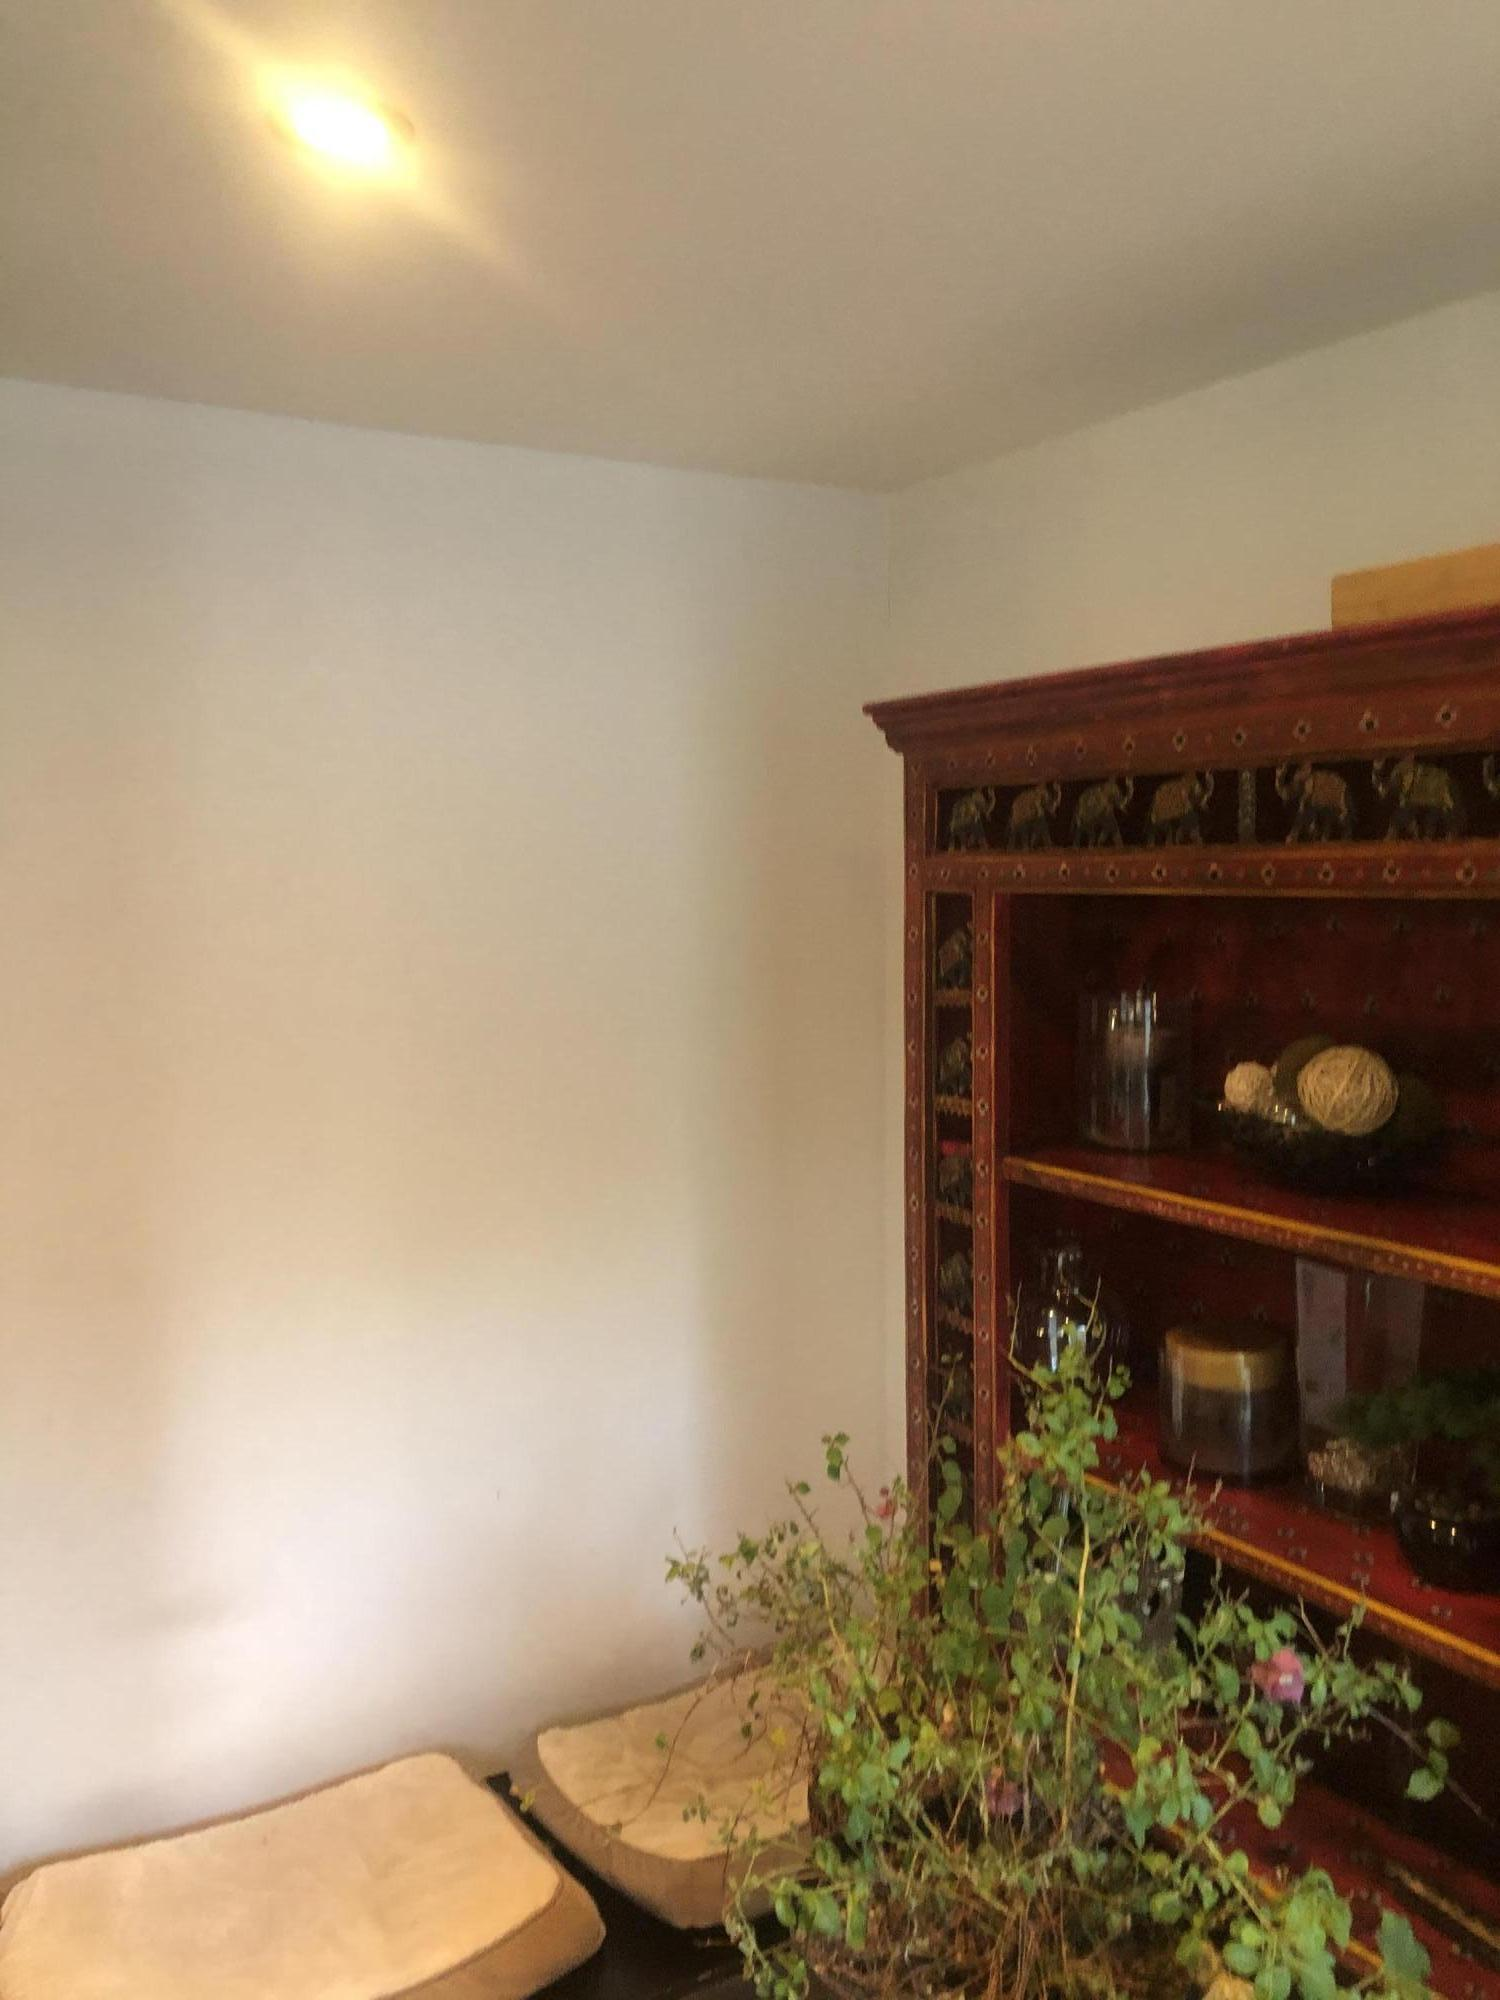 716 LAKESHORE Drive, El Paso, Texas 79932, 2 Bedrooms Bedrooms, ,2 BathroomsBathrooms,Residential Rental,For Rent,LAKESHORE,837264